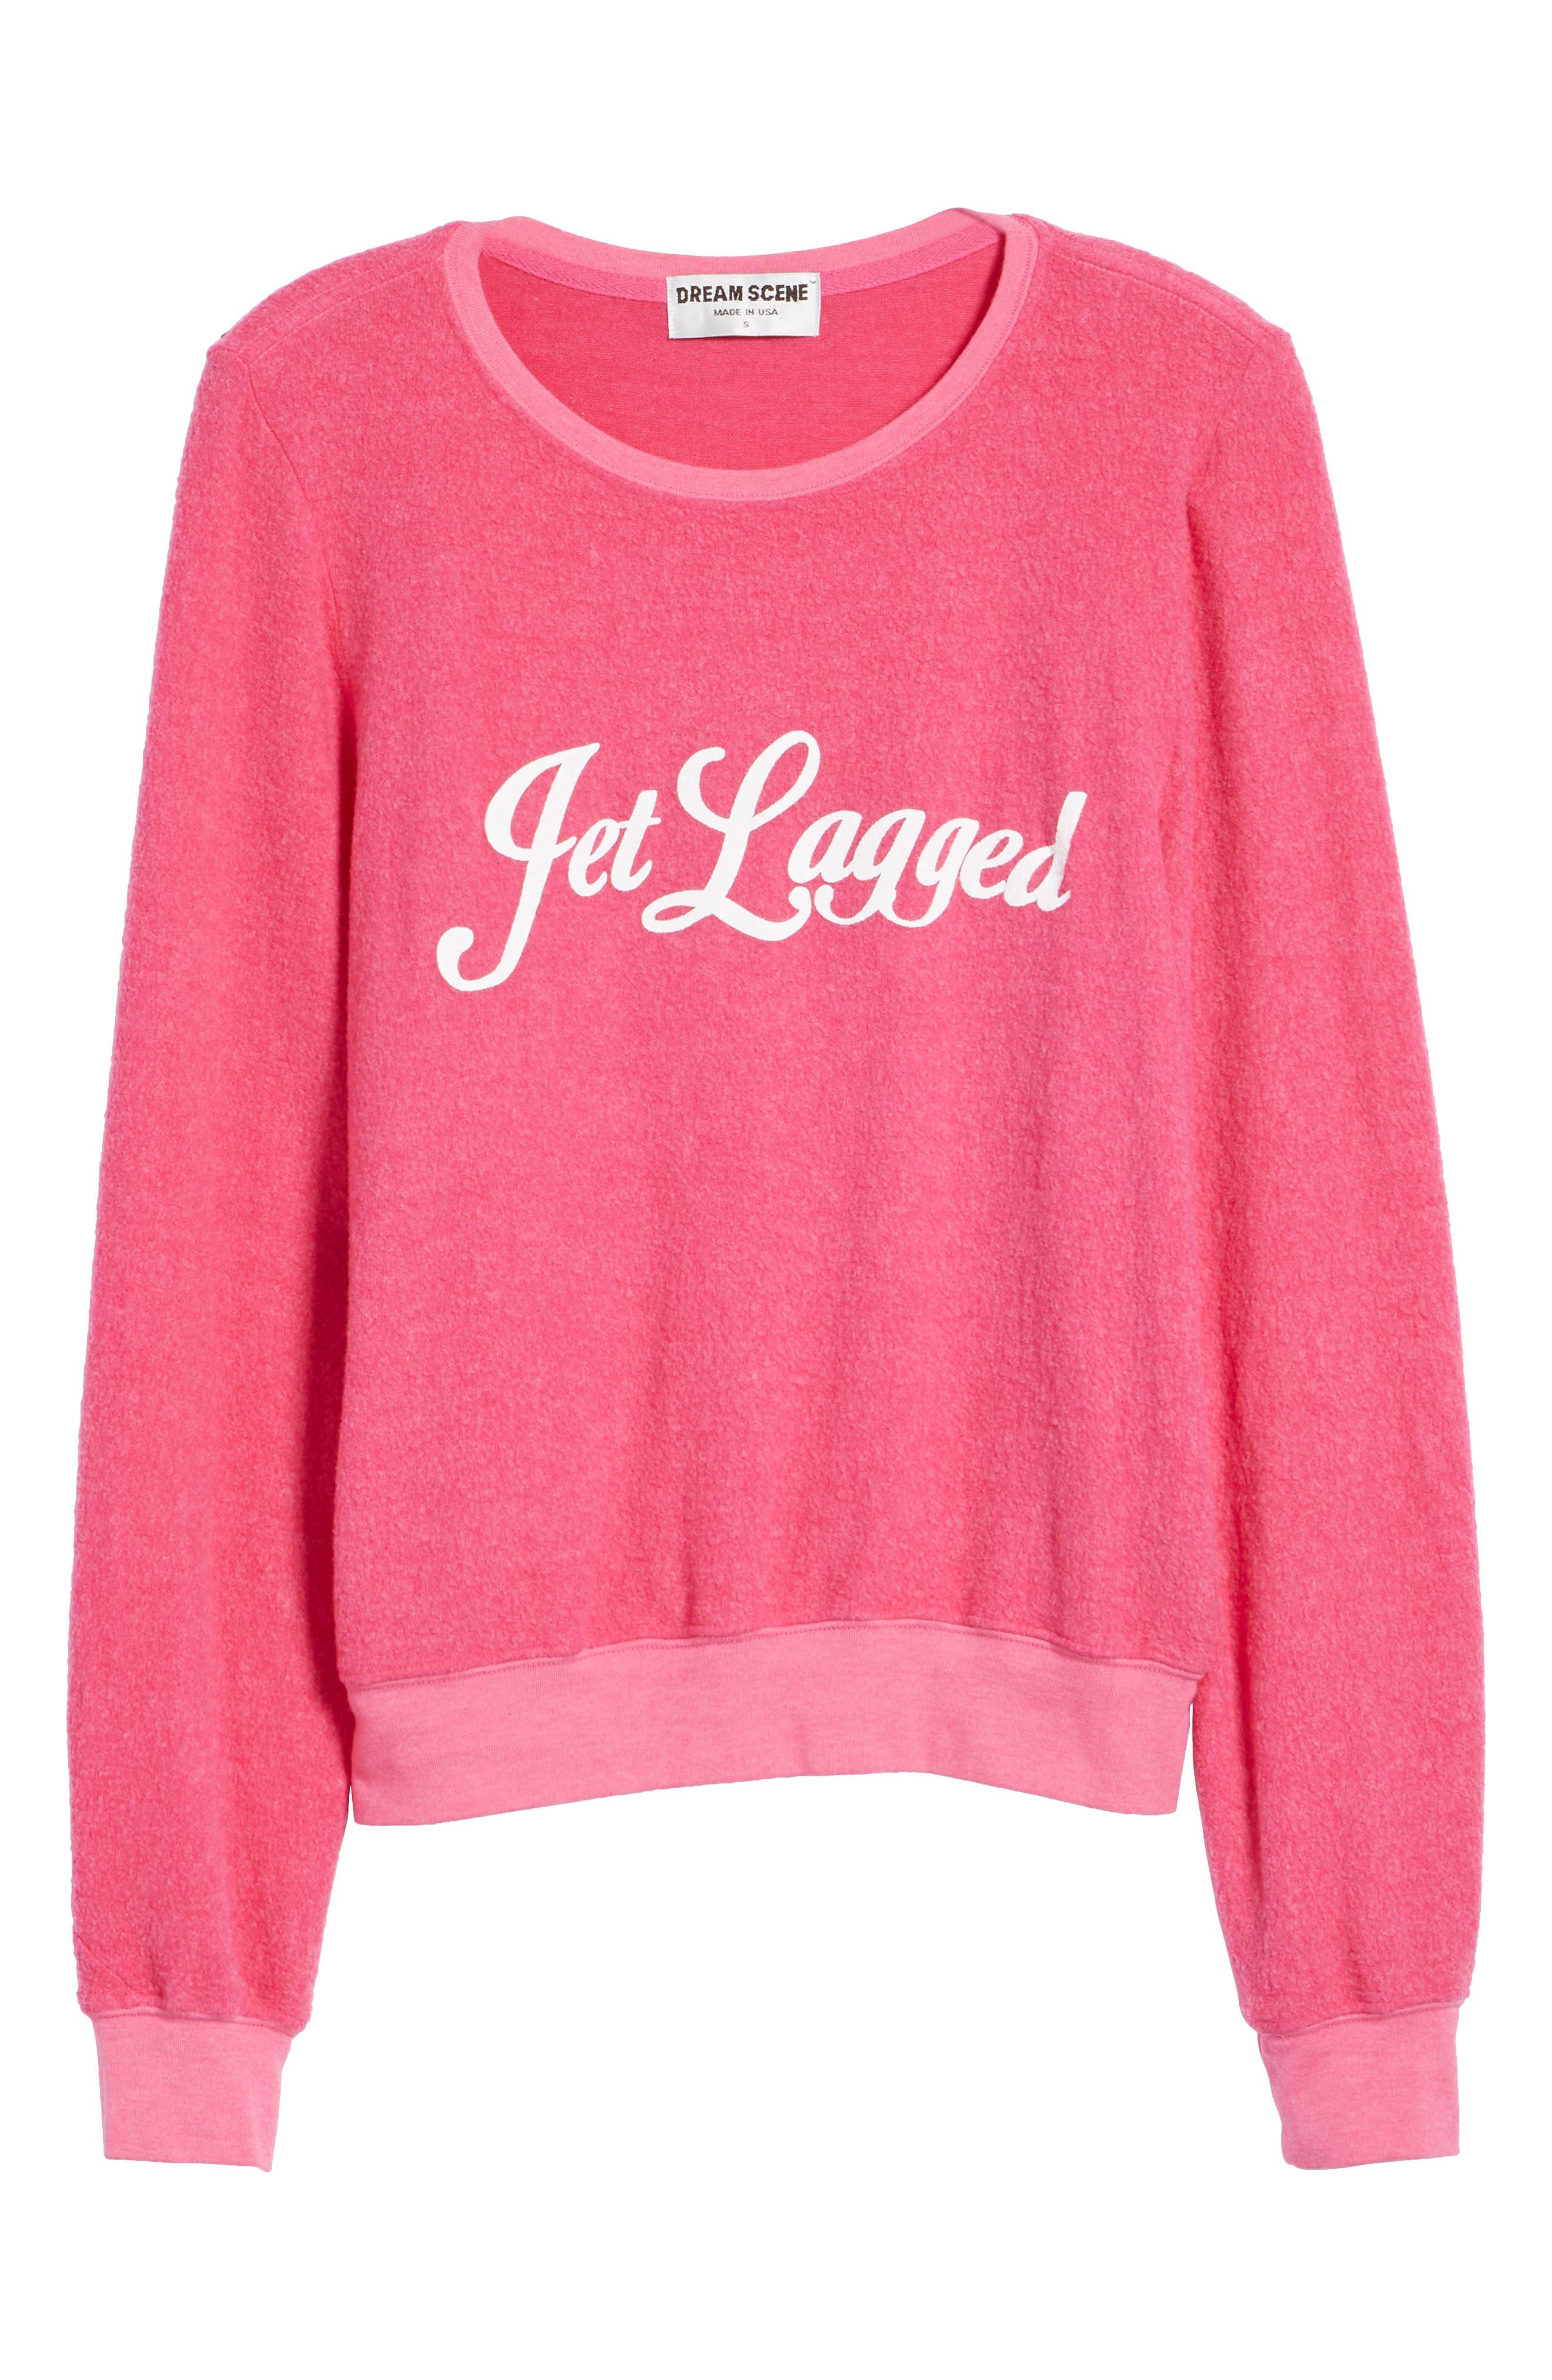 Jet Lagged Sweatshirt,                             Alternate thumbnail 6, color,